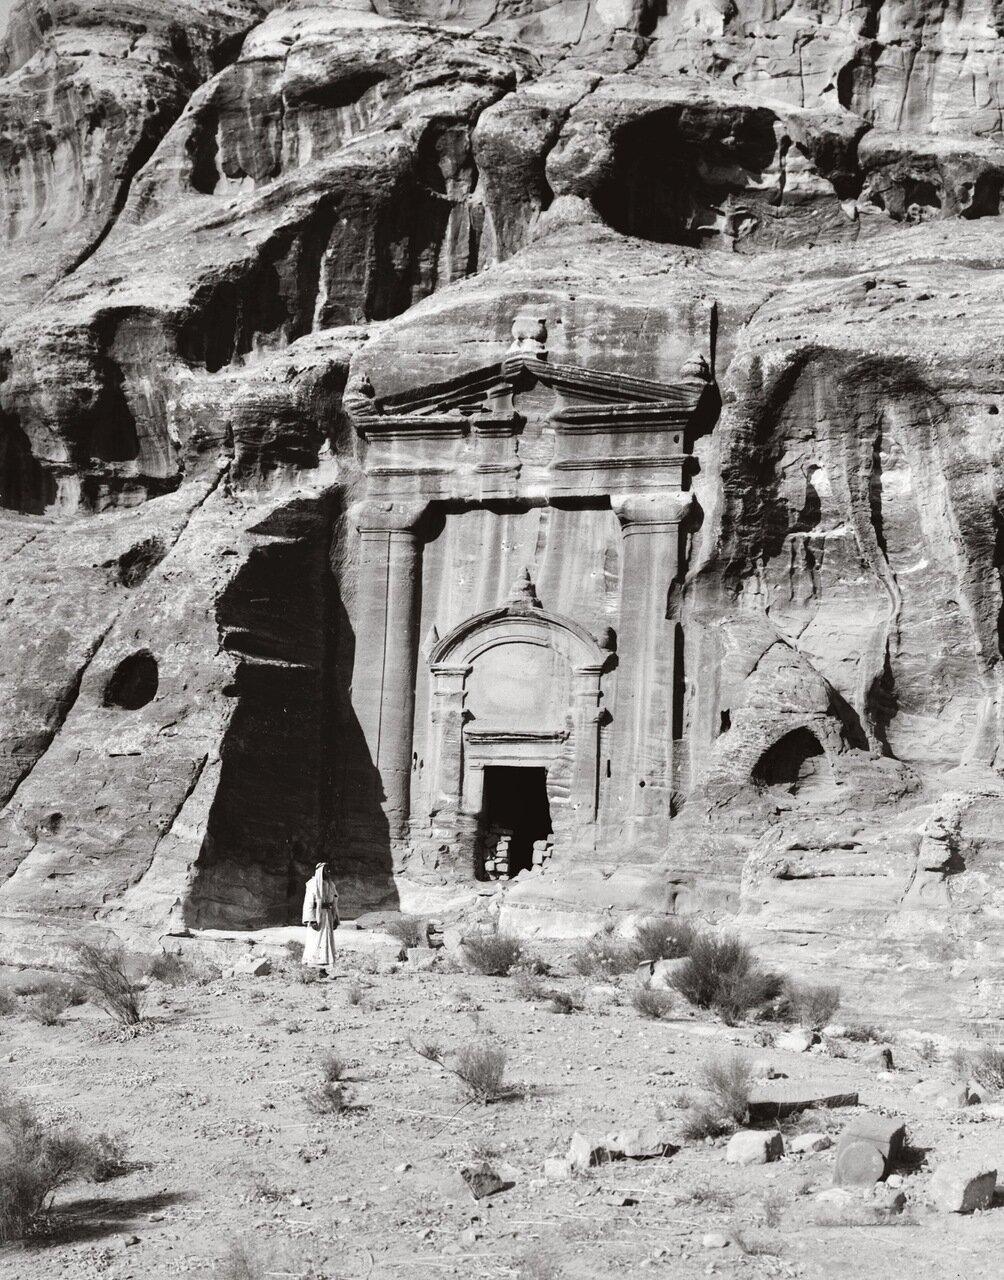 Гробница с тремя урнами. Петра, Трансиордания. 1900-1920 гг.